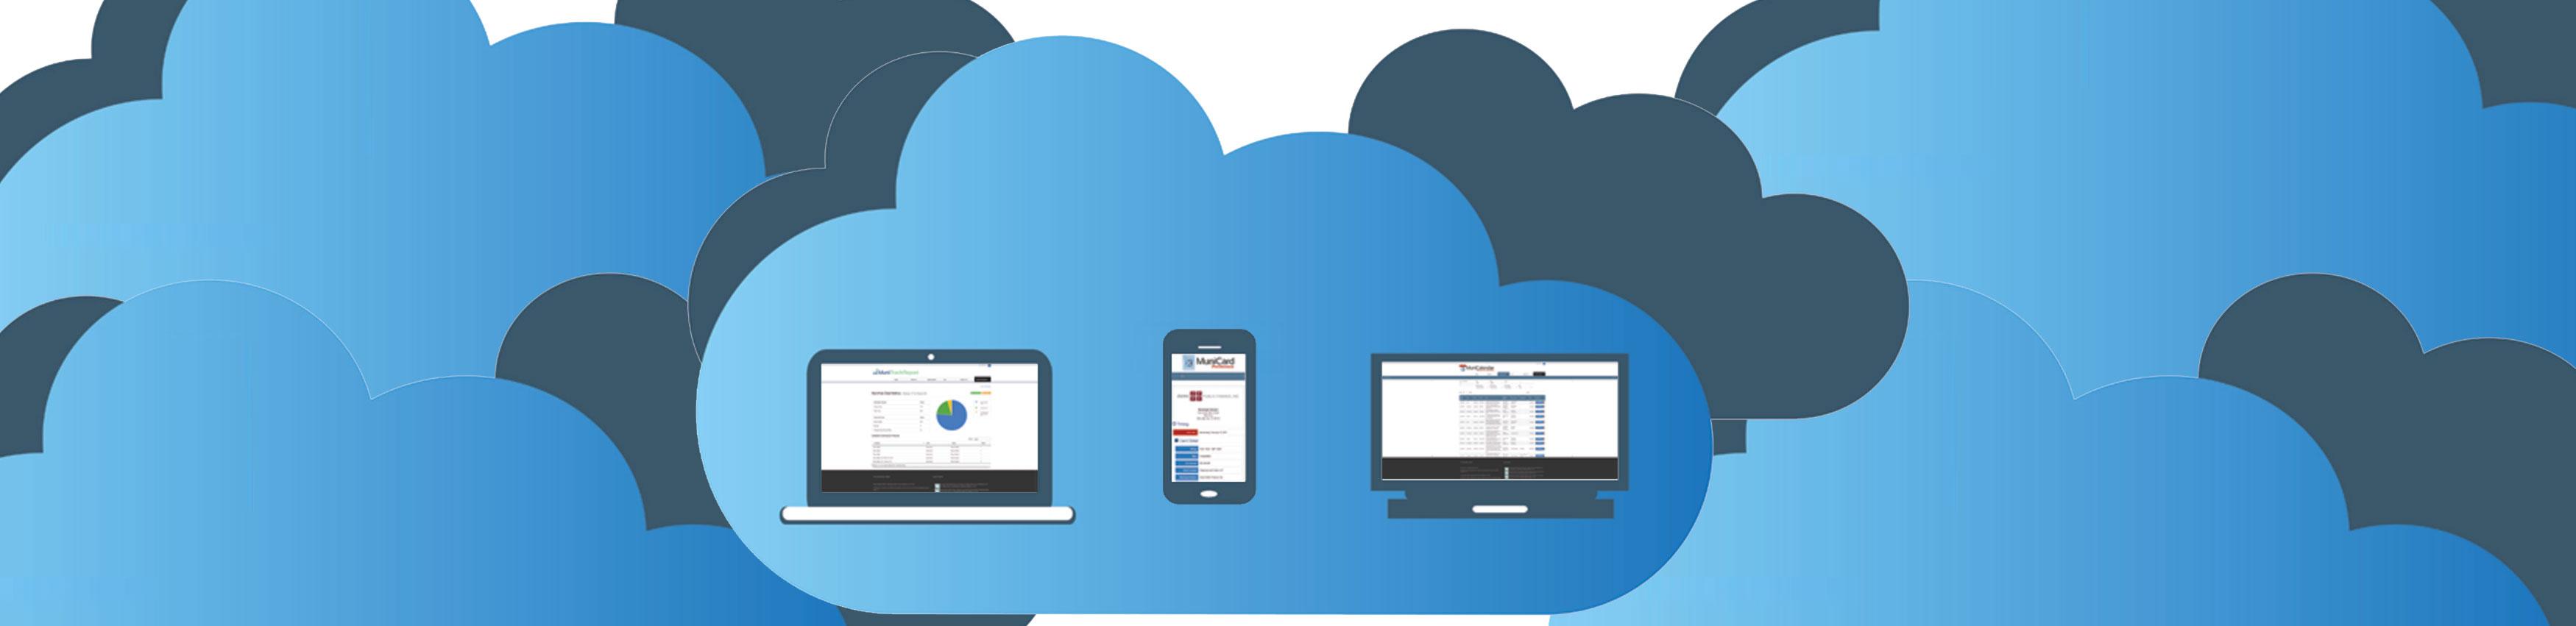 cloudSystem21